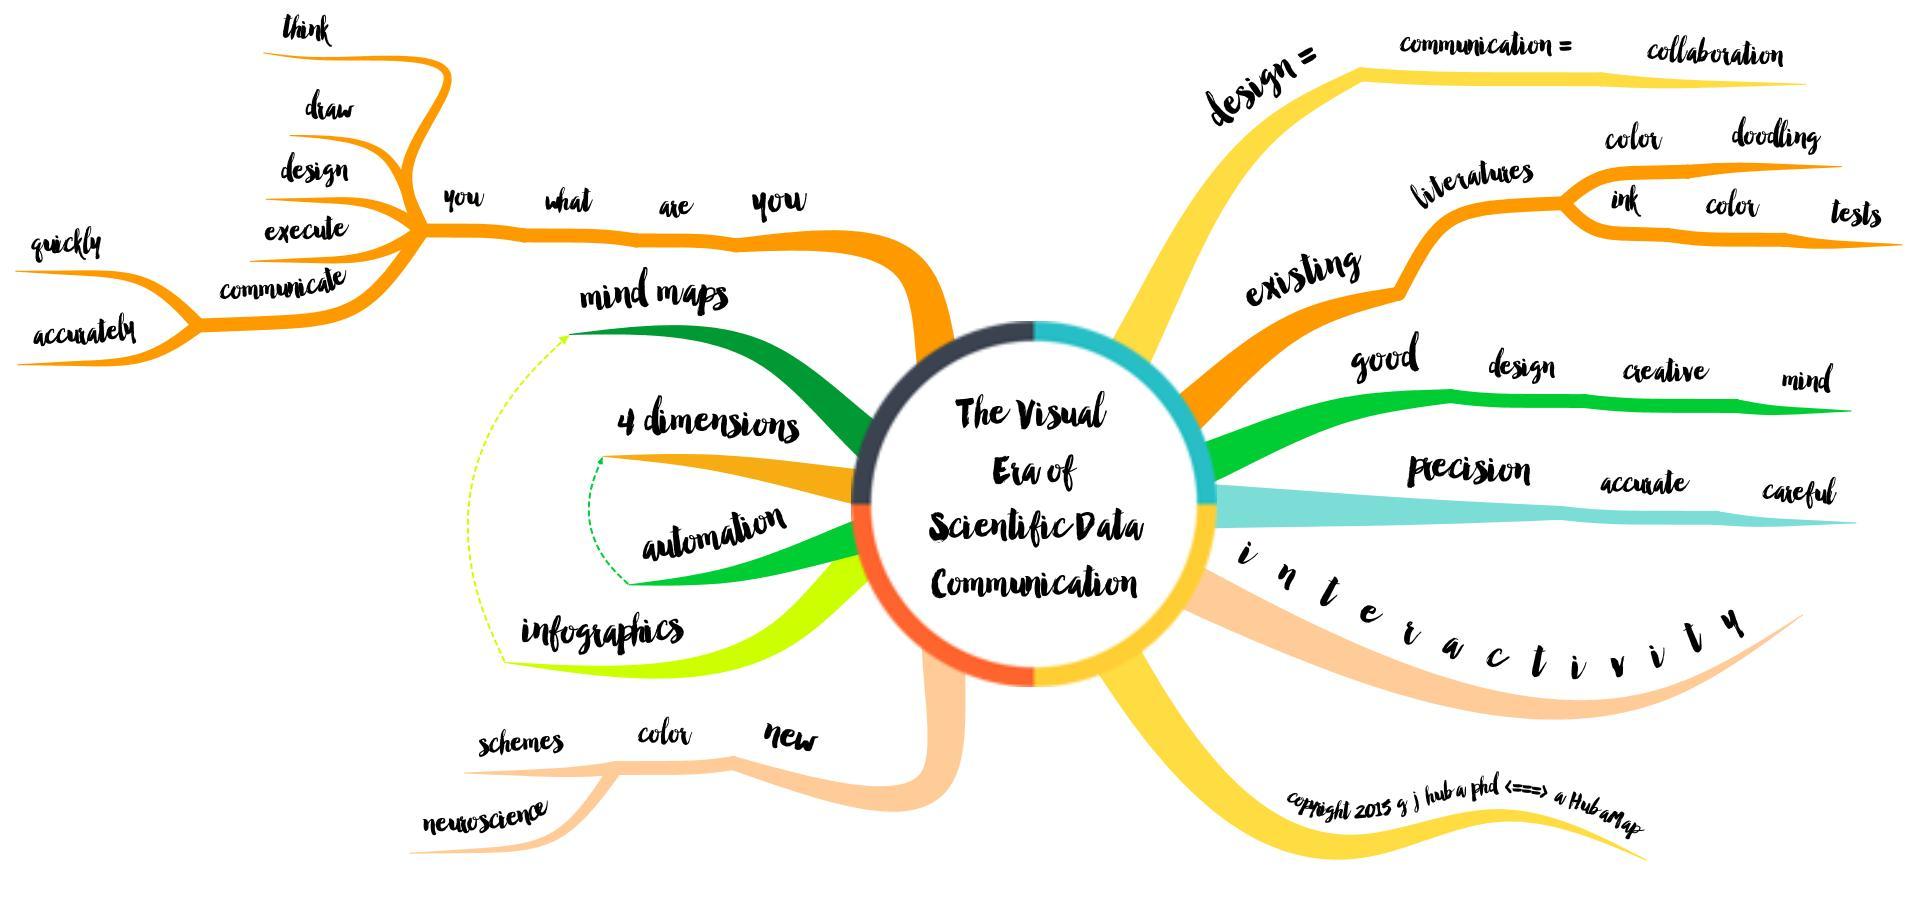 The Visual Era of Scientific Data Communication